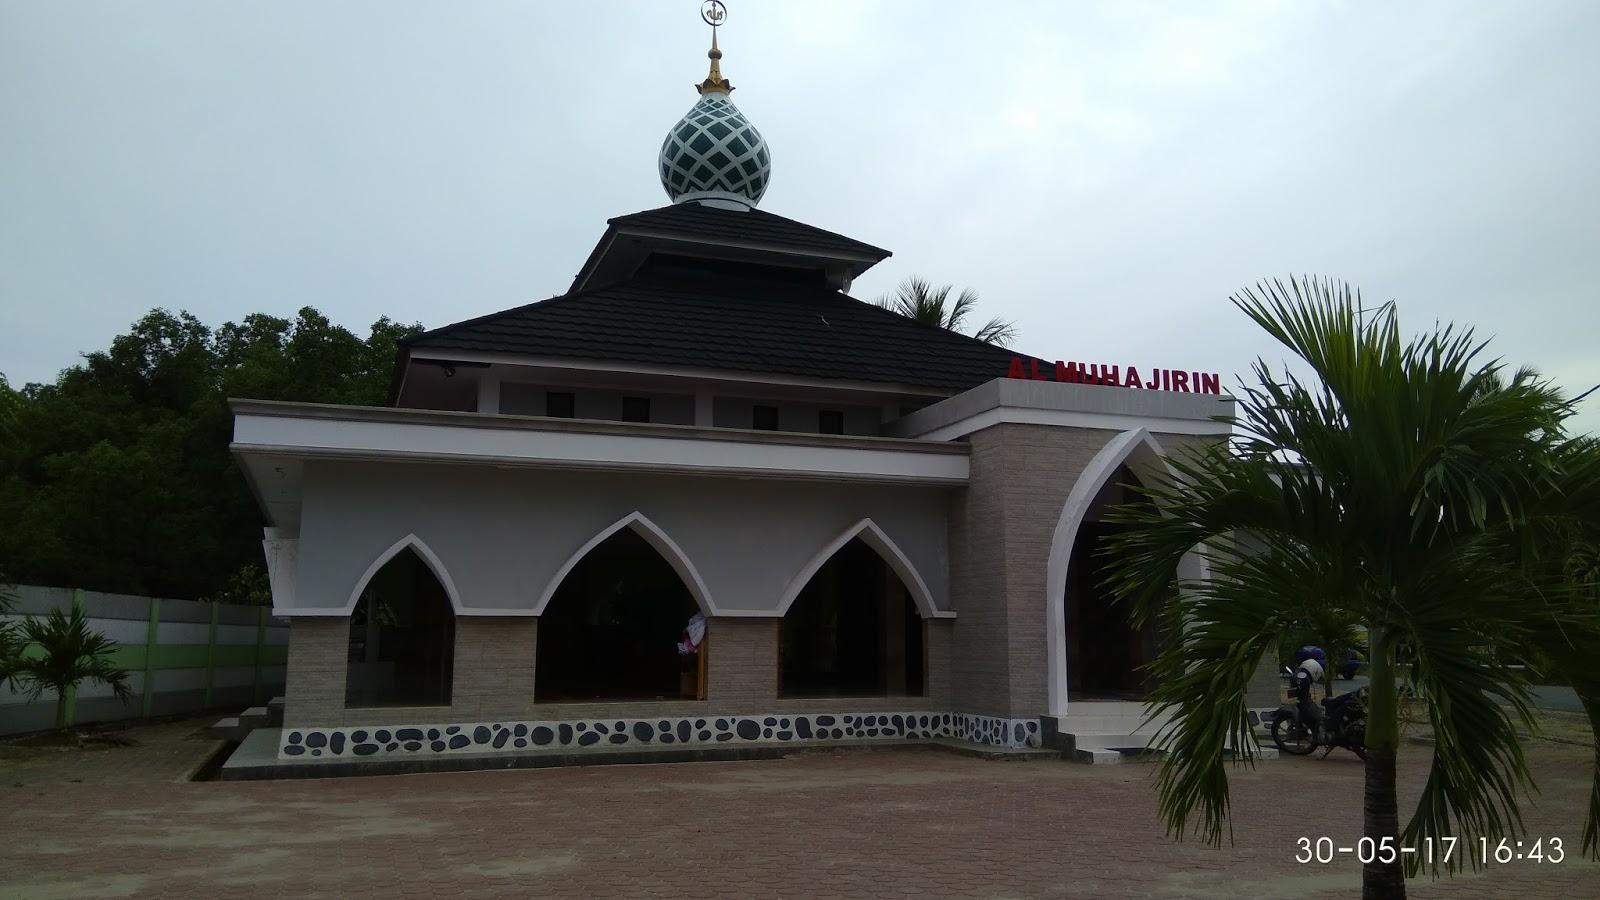 Masjid Di Dekat Lokasi Wisata Kota Bengkulu Zefy Arlinda Sandal Wudhu Mushola Kantor Hotel Al Muhajirin